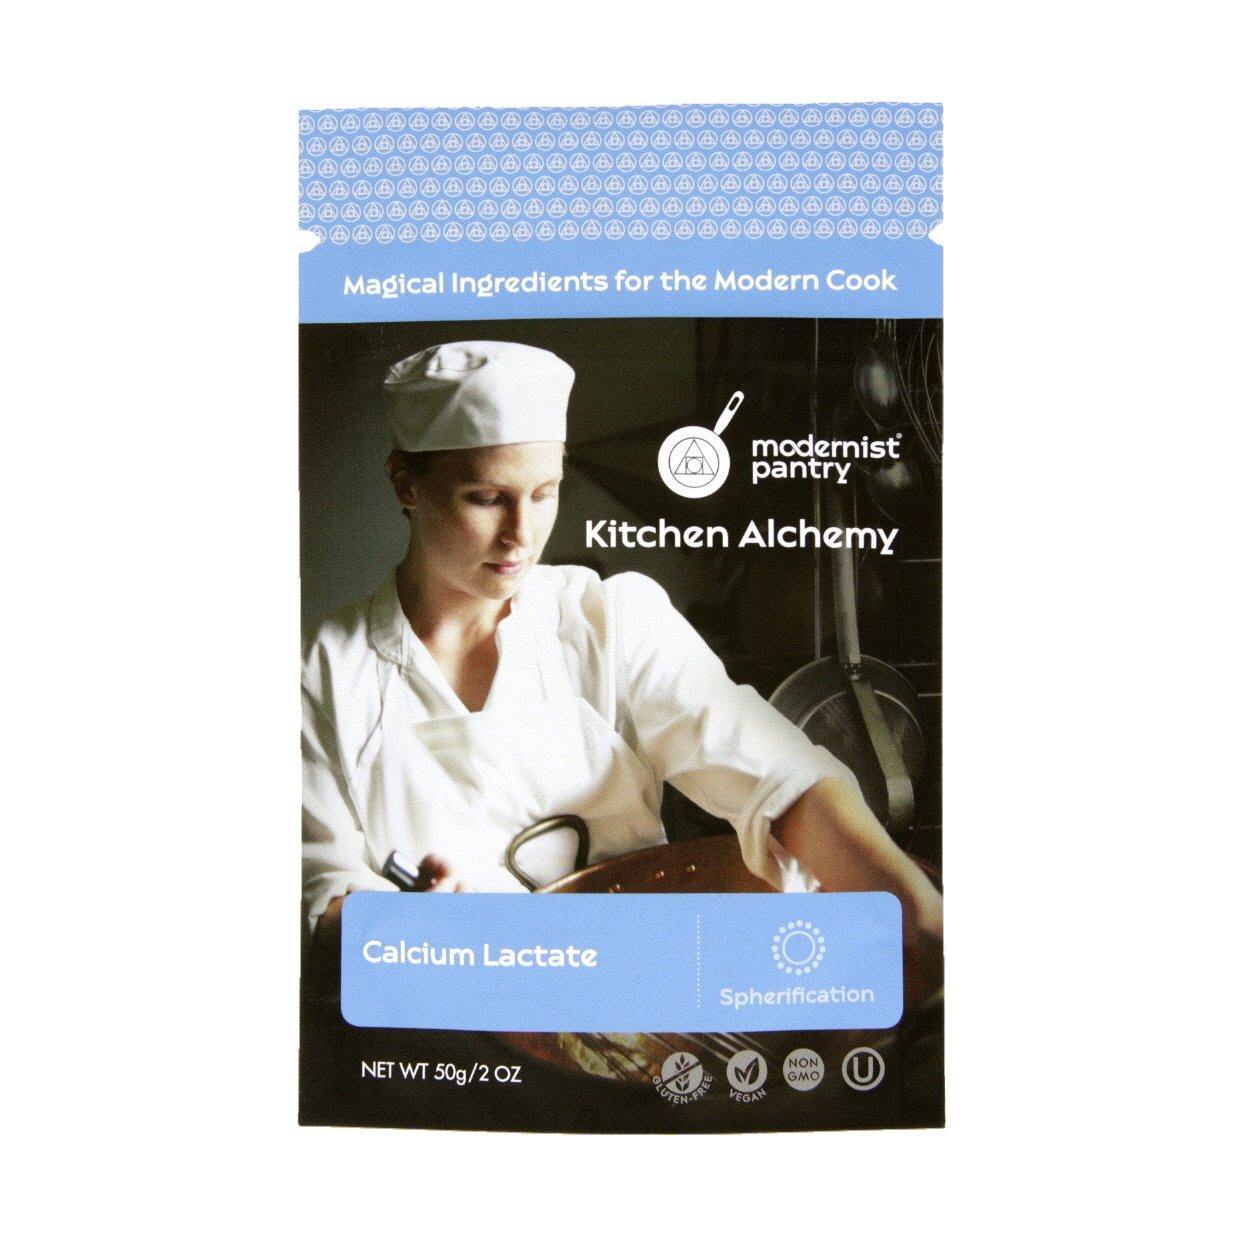 Modernist Pantry Food Grade Calcium Lactate, 1.8 oz